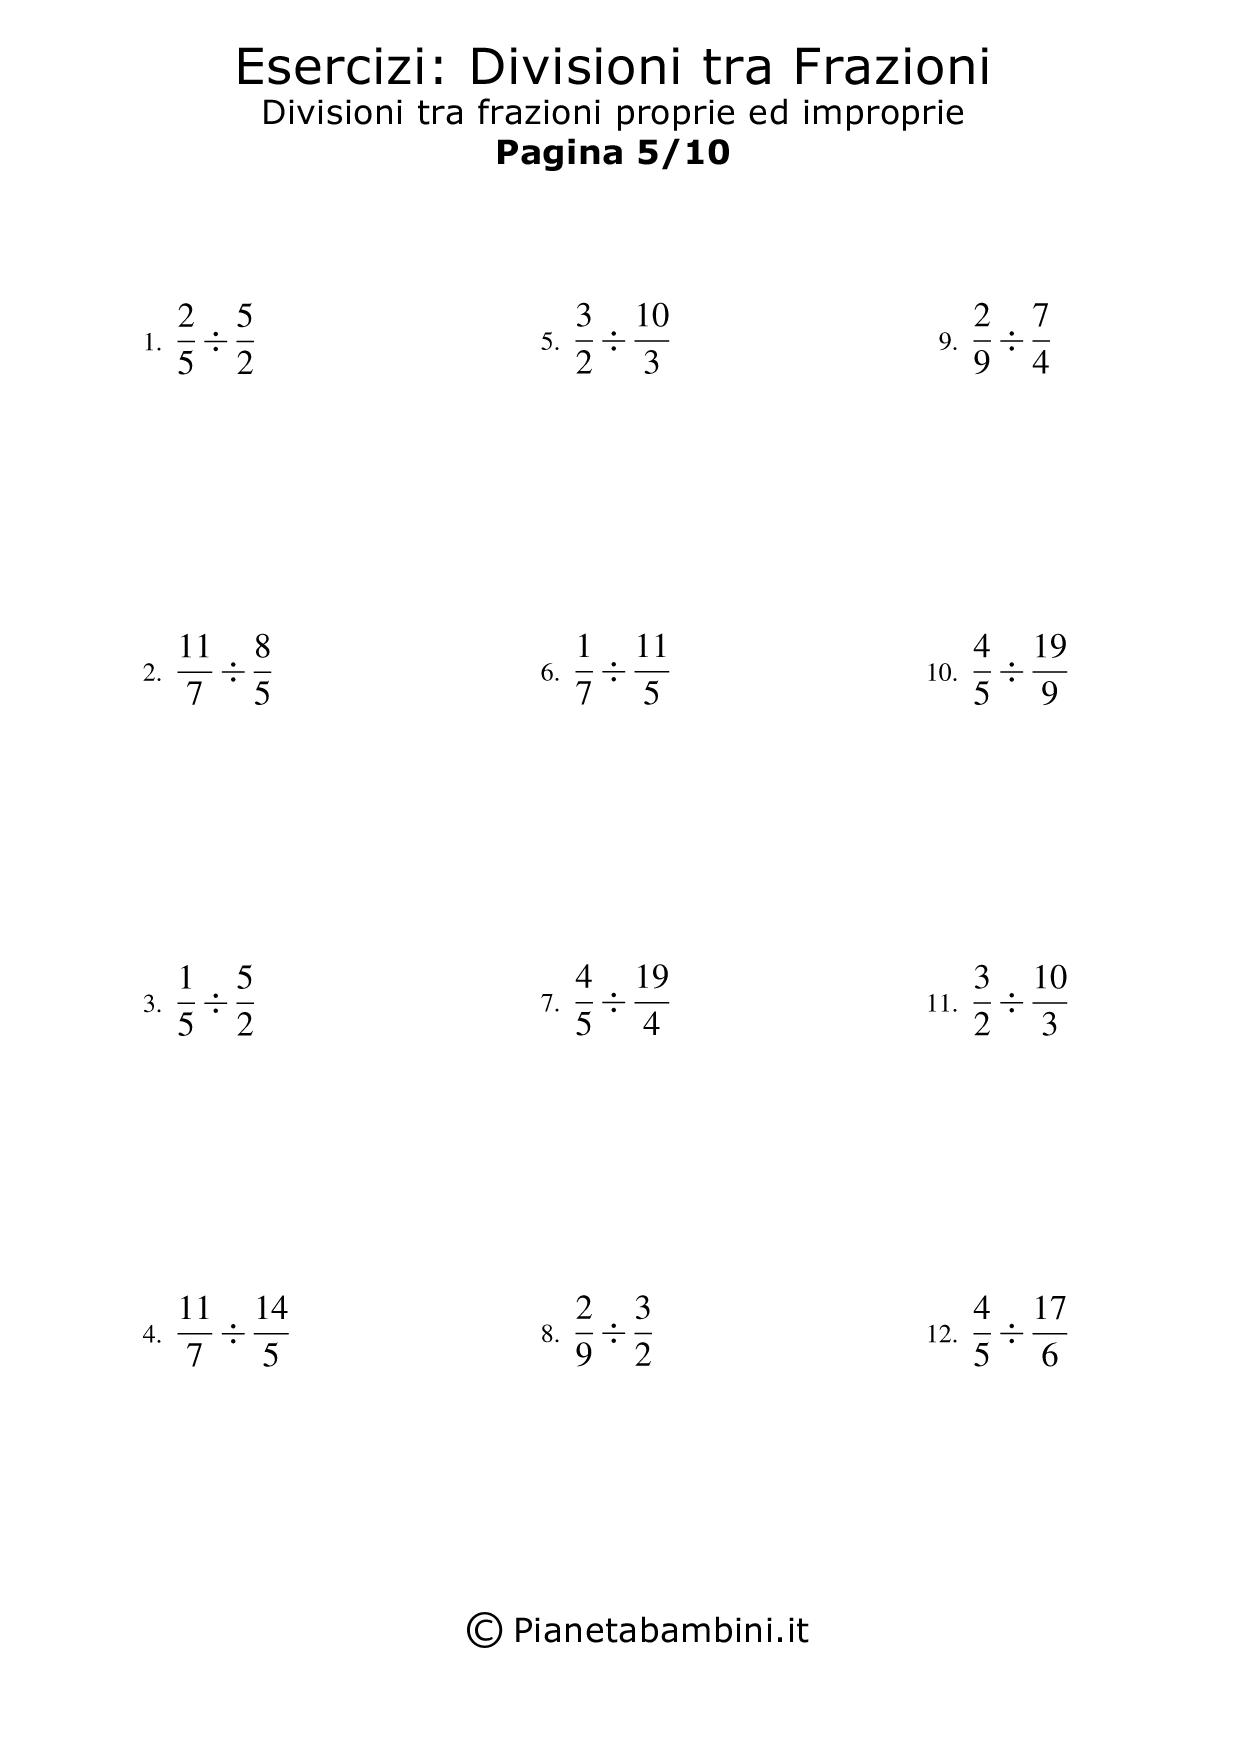 Esercizi-Divisioni-Frazioni-Proprie-Improprie_05